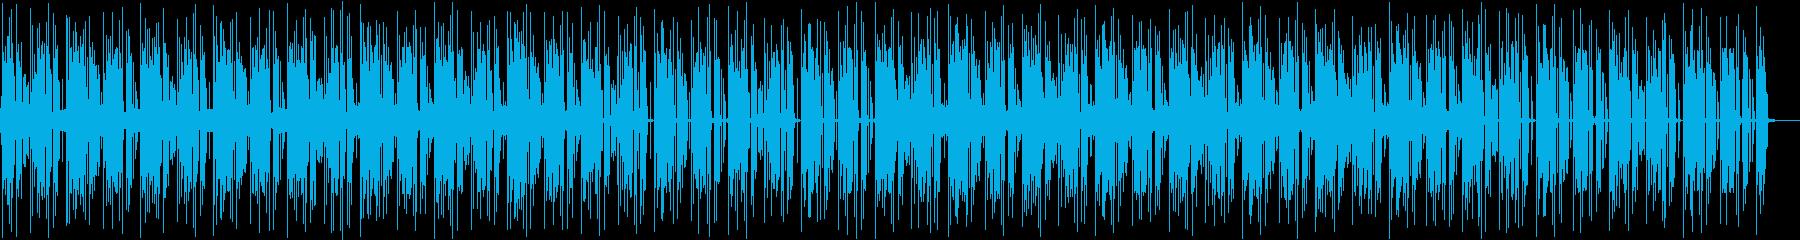 hiphop・シリアス・ミステリー・推理の再生済みの波形